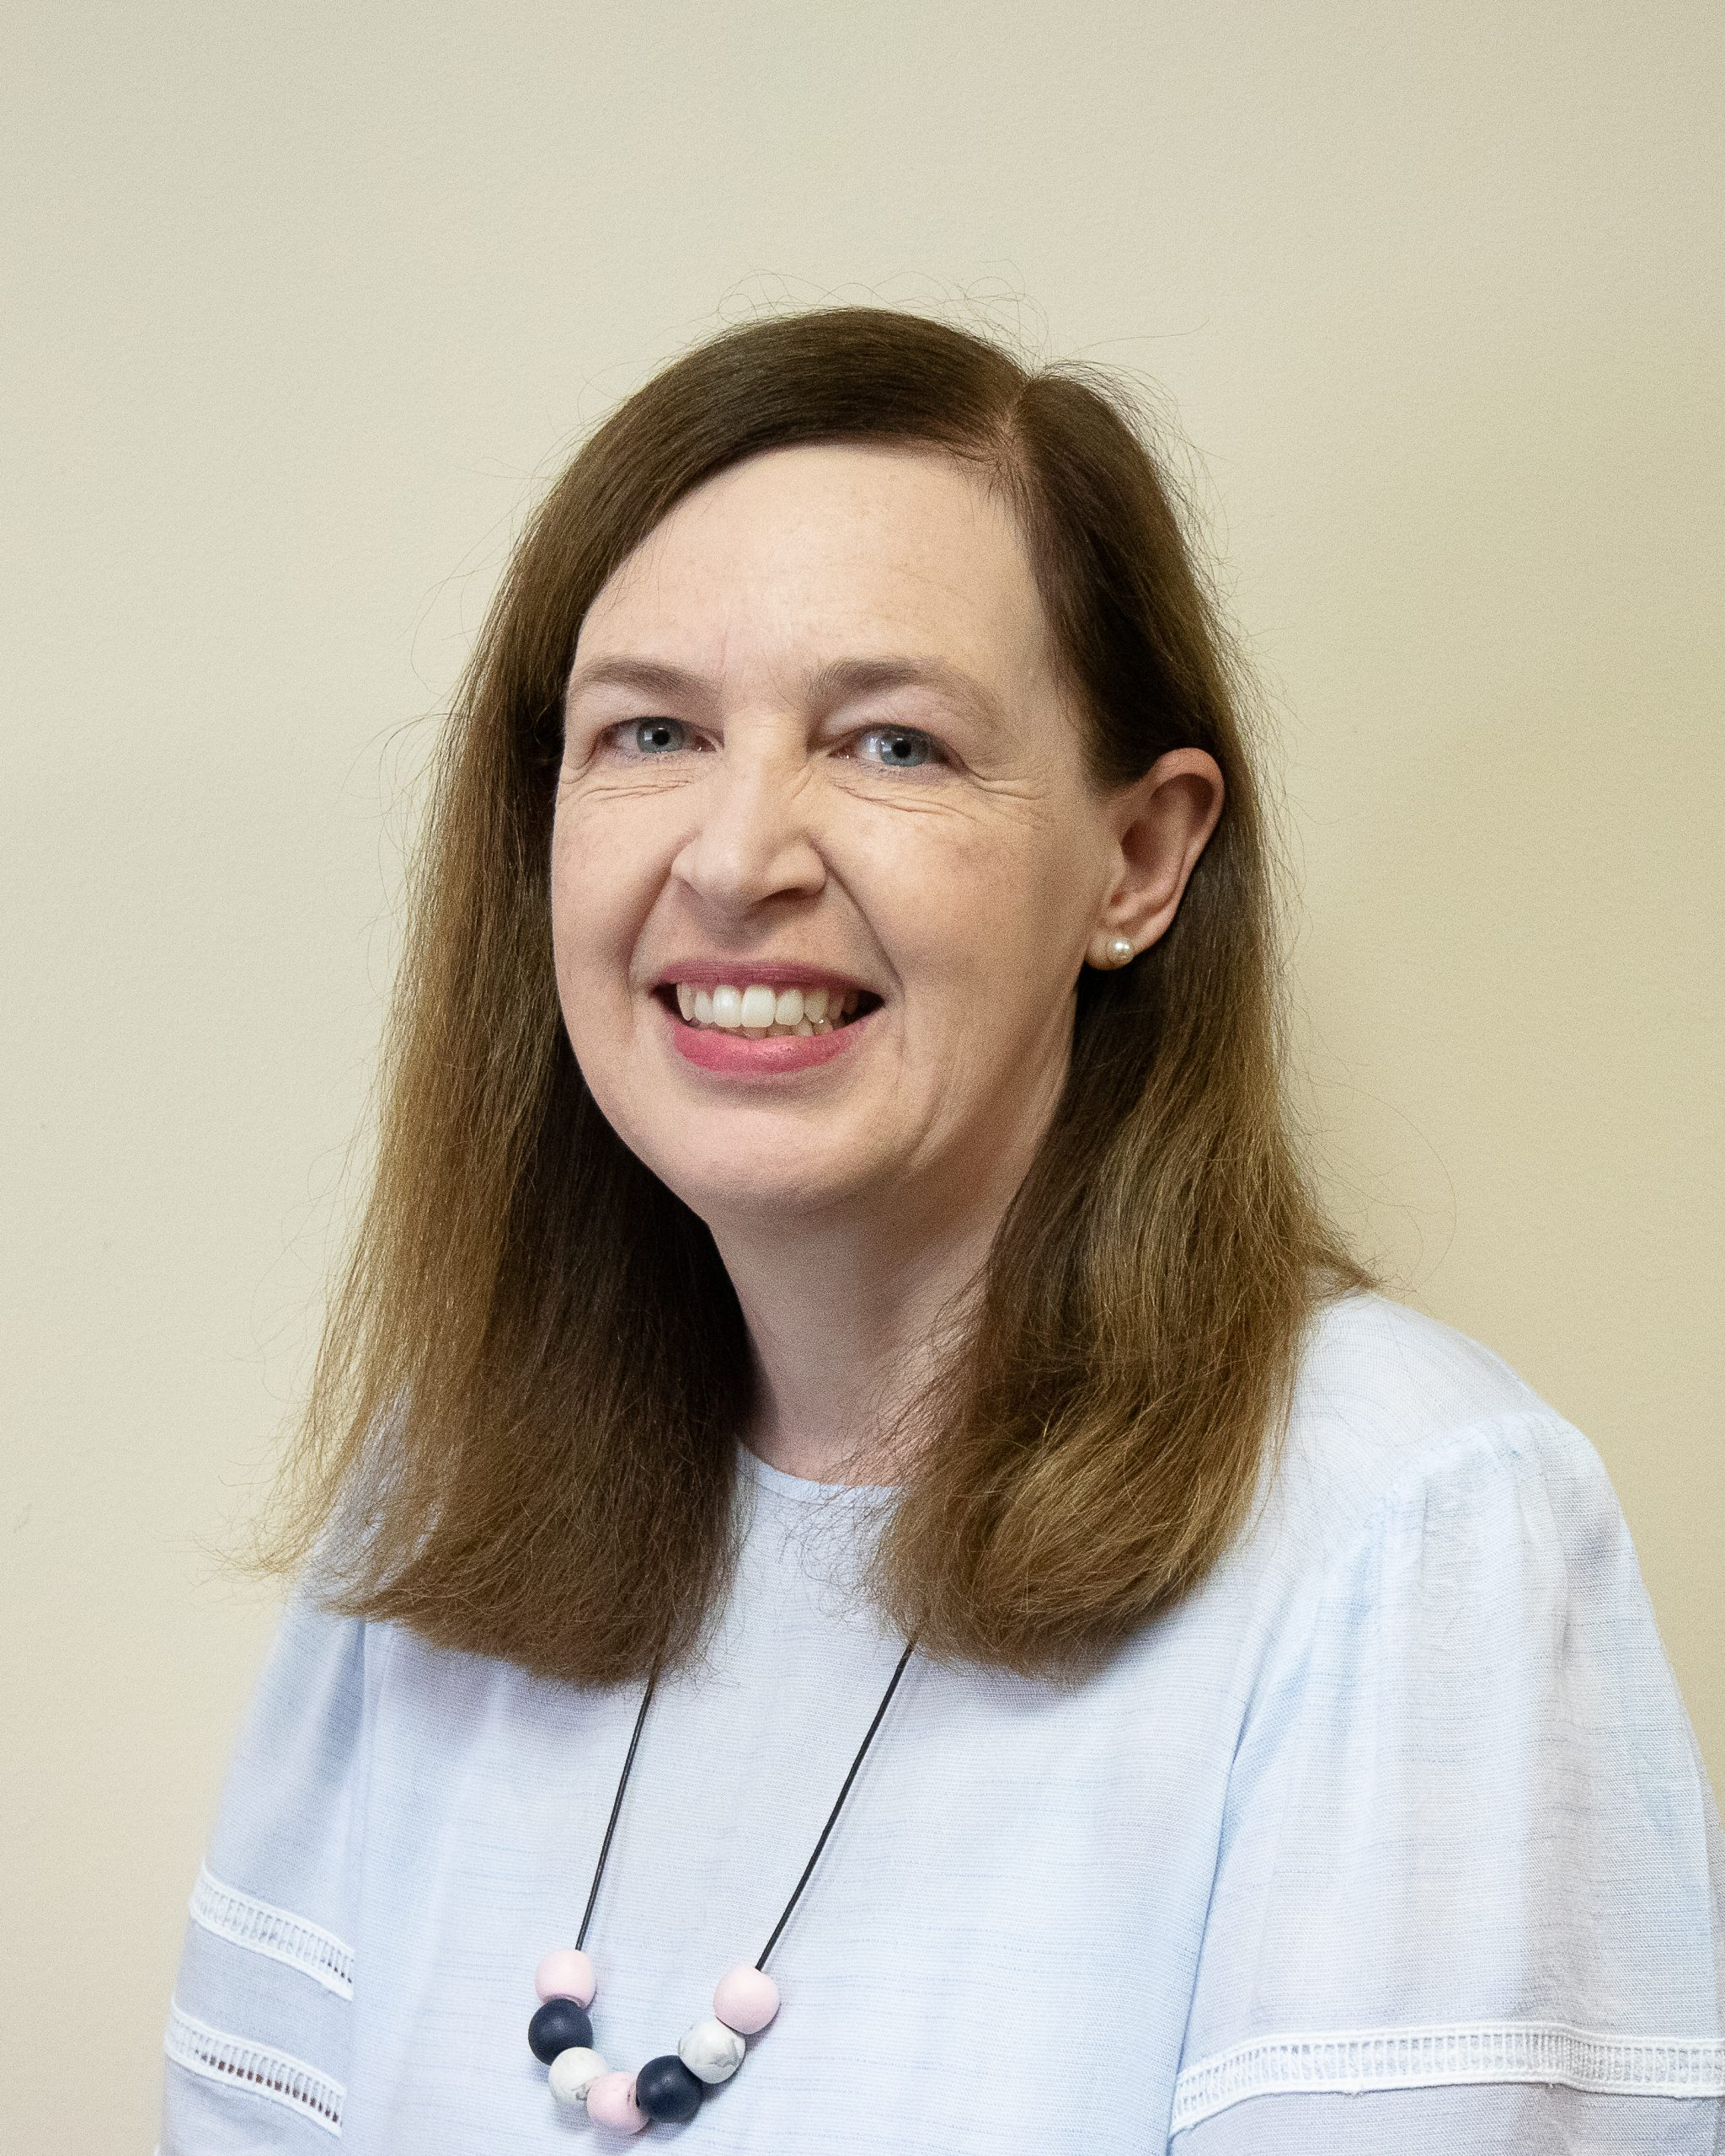 Alison Jeisman